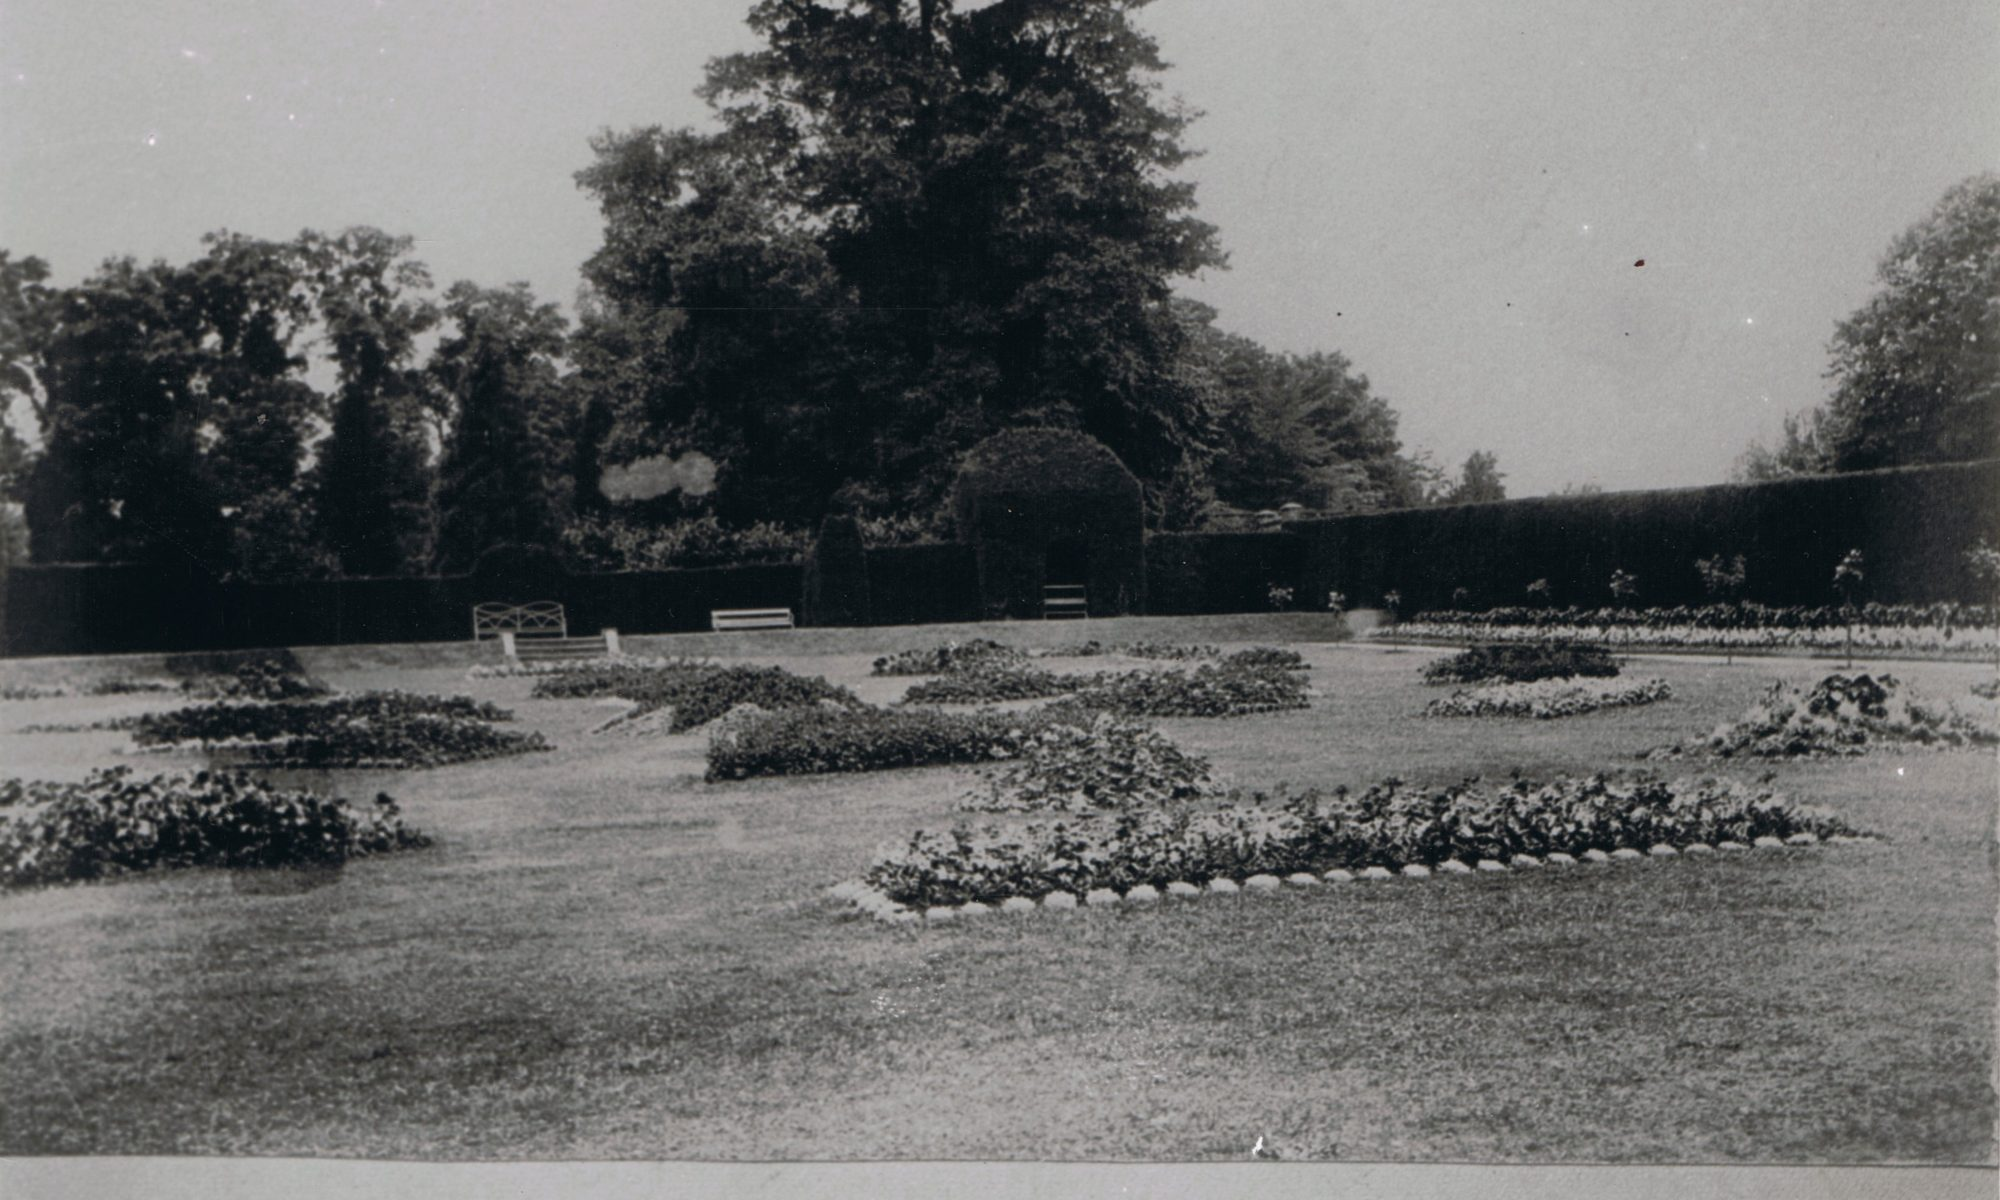 An Early Photograph of the Flower Garden